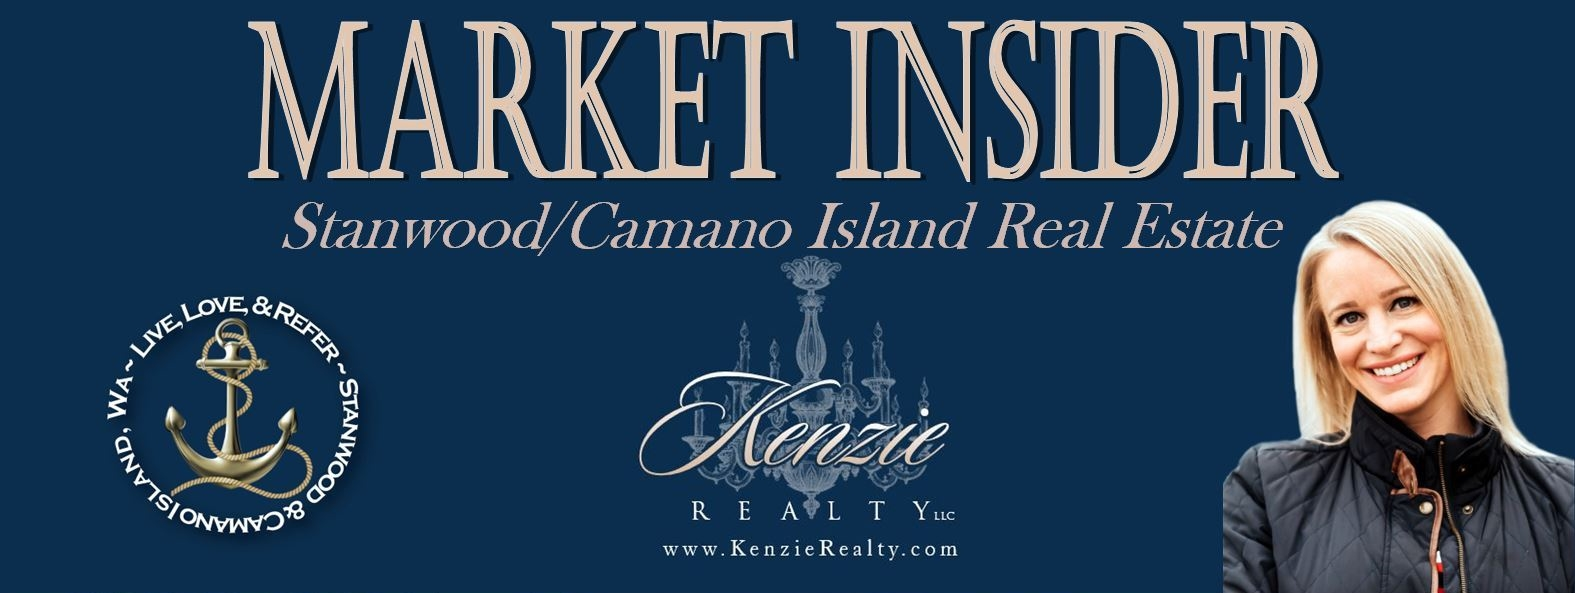 Market Insider Report | Kenzie Realty